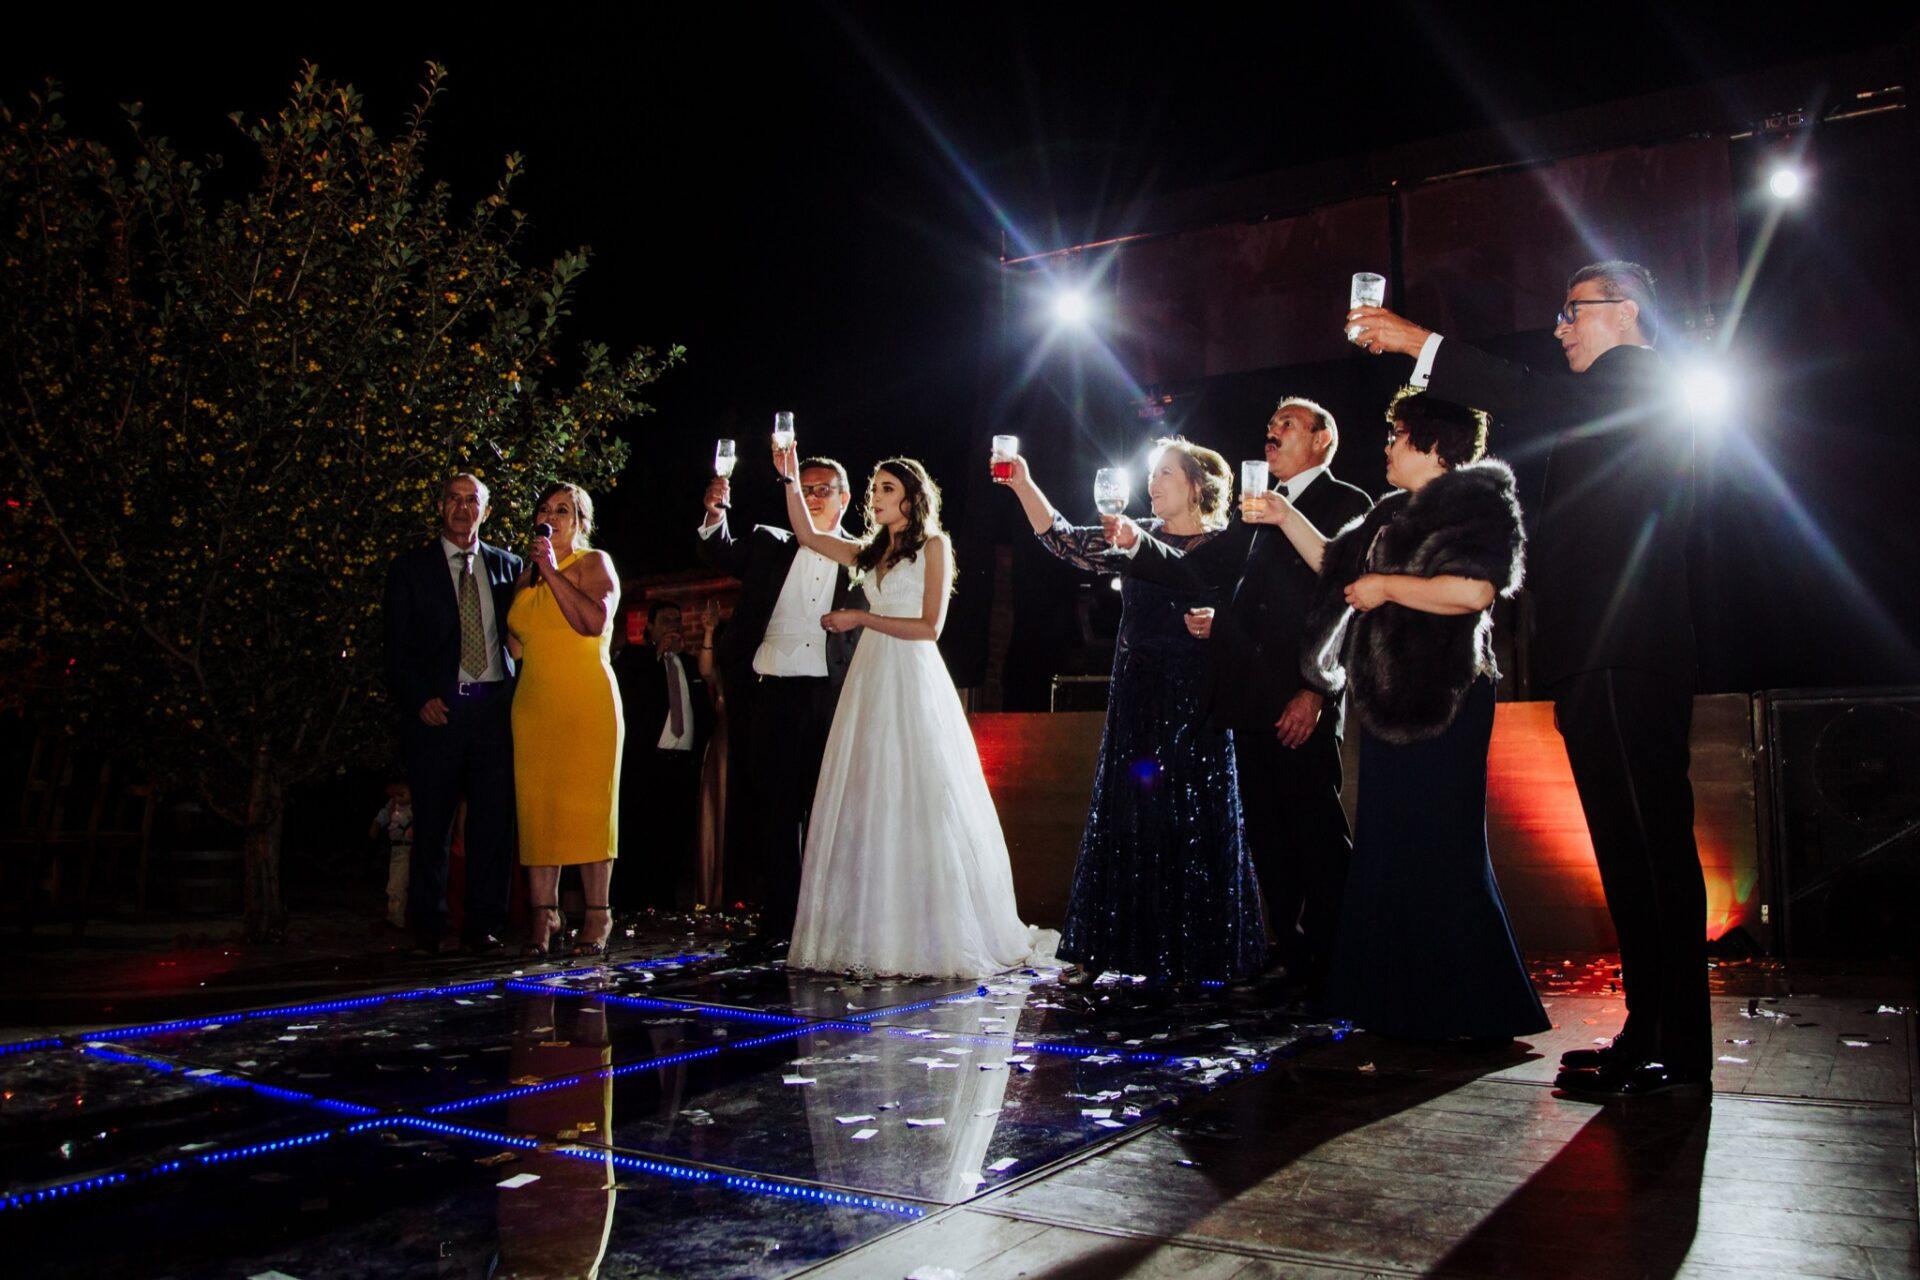 javier_noriega_fotografo_bodas_teul_zacatecas_wedding_photographer40